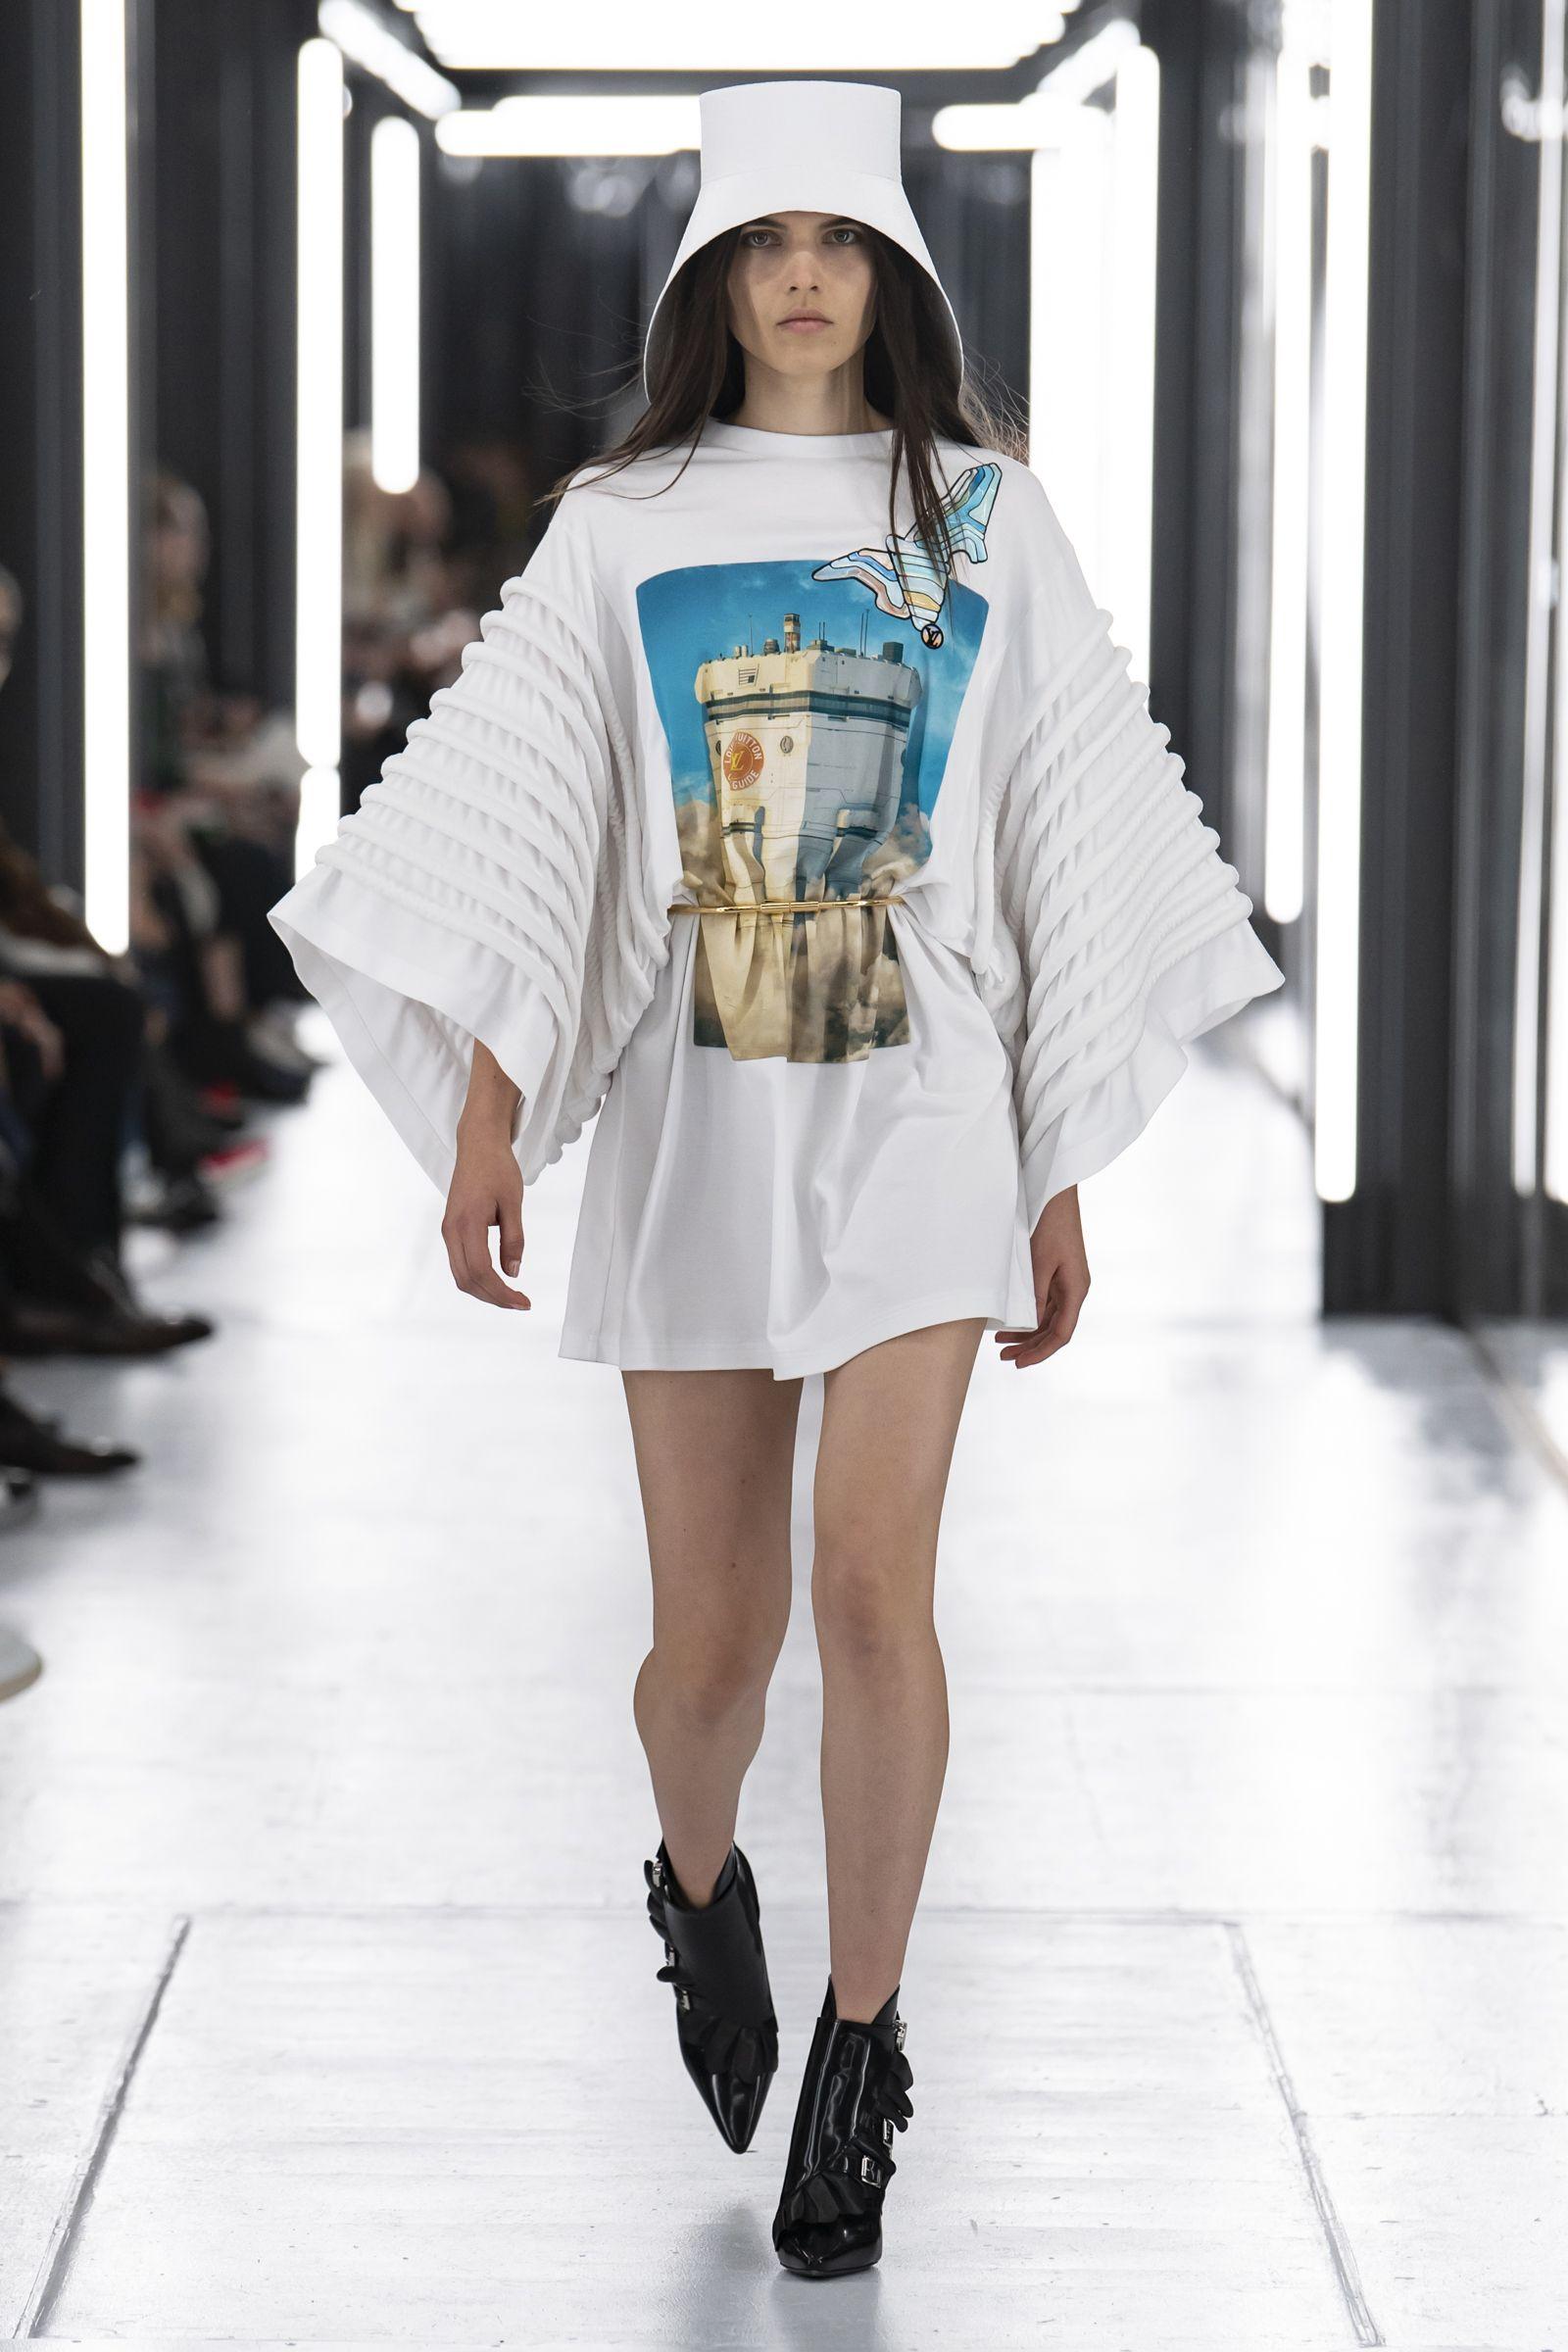 Look from the Louis Vuitton Women's Spring-Summer 2019 Fashion Show, by  Nicolas Ghesquière. | Fashion, Fashion week, Fashion show